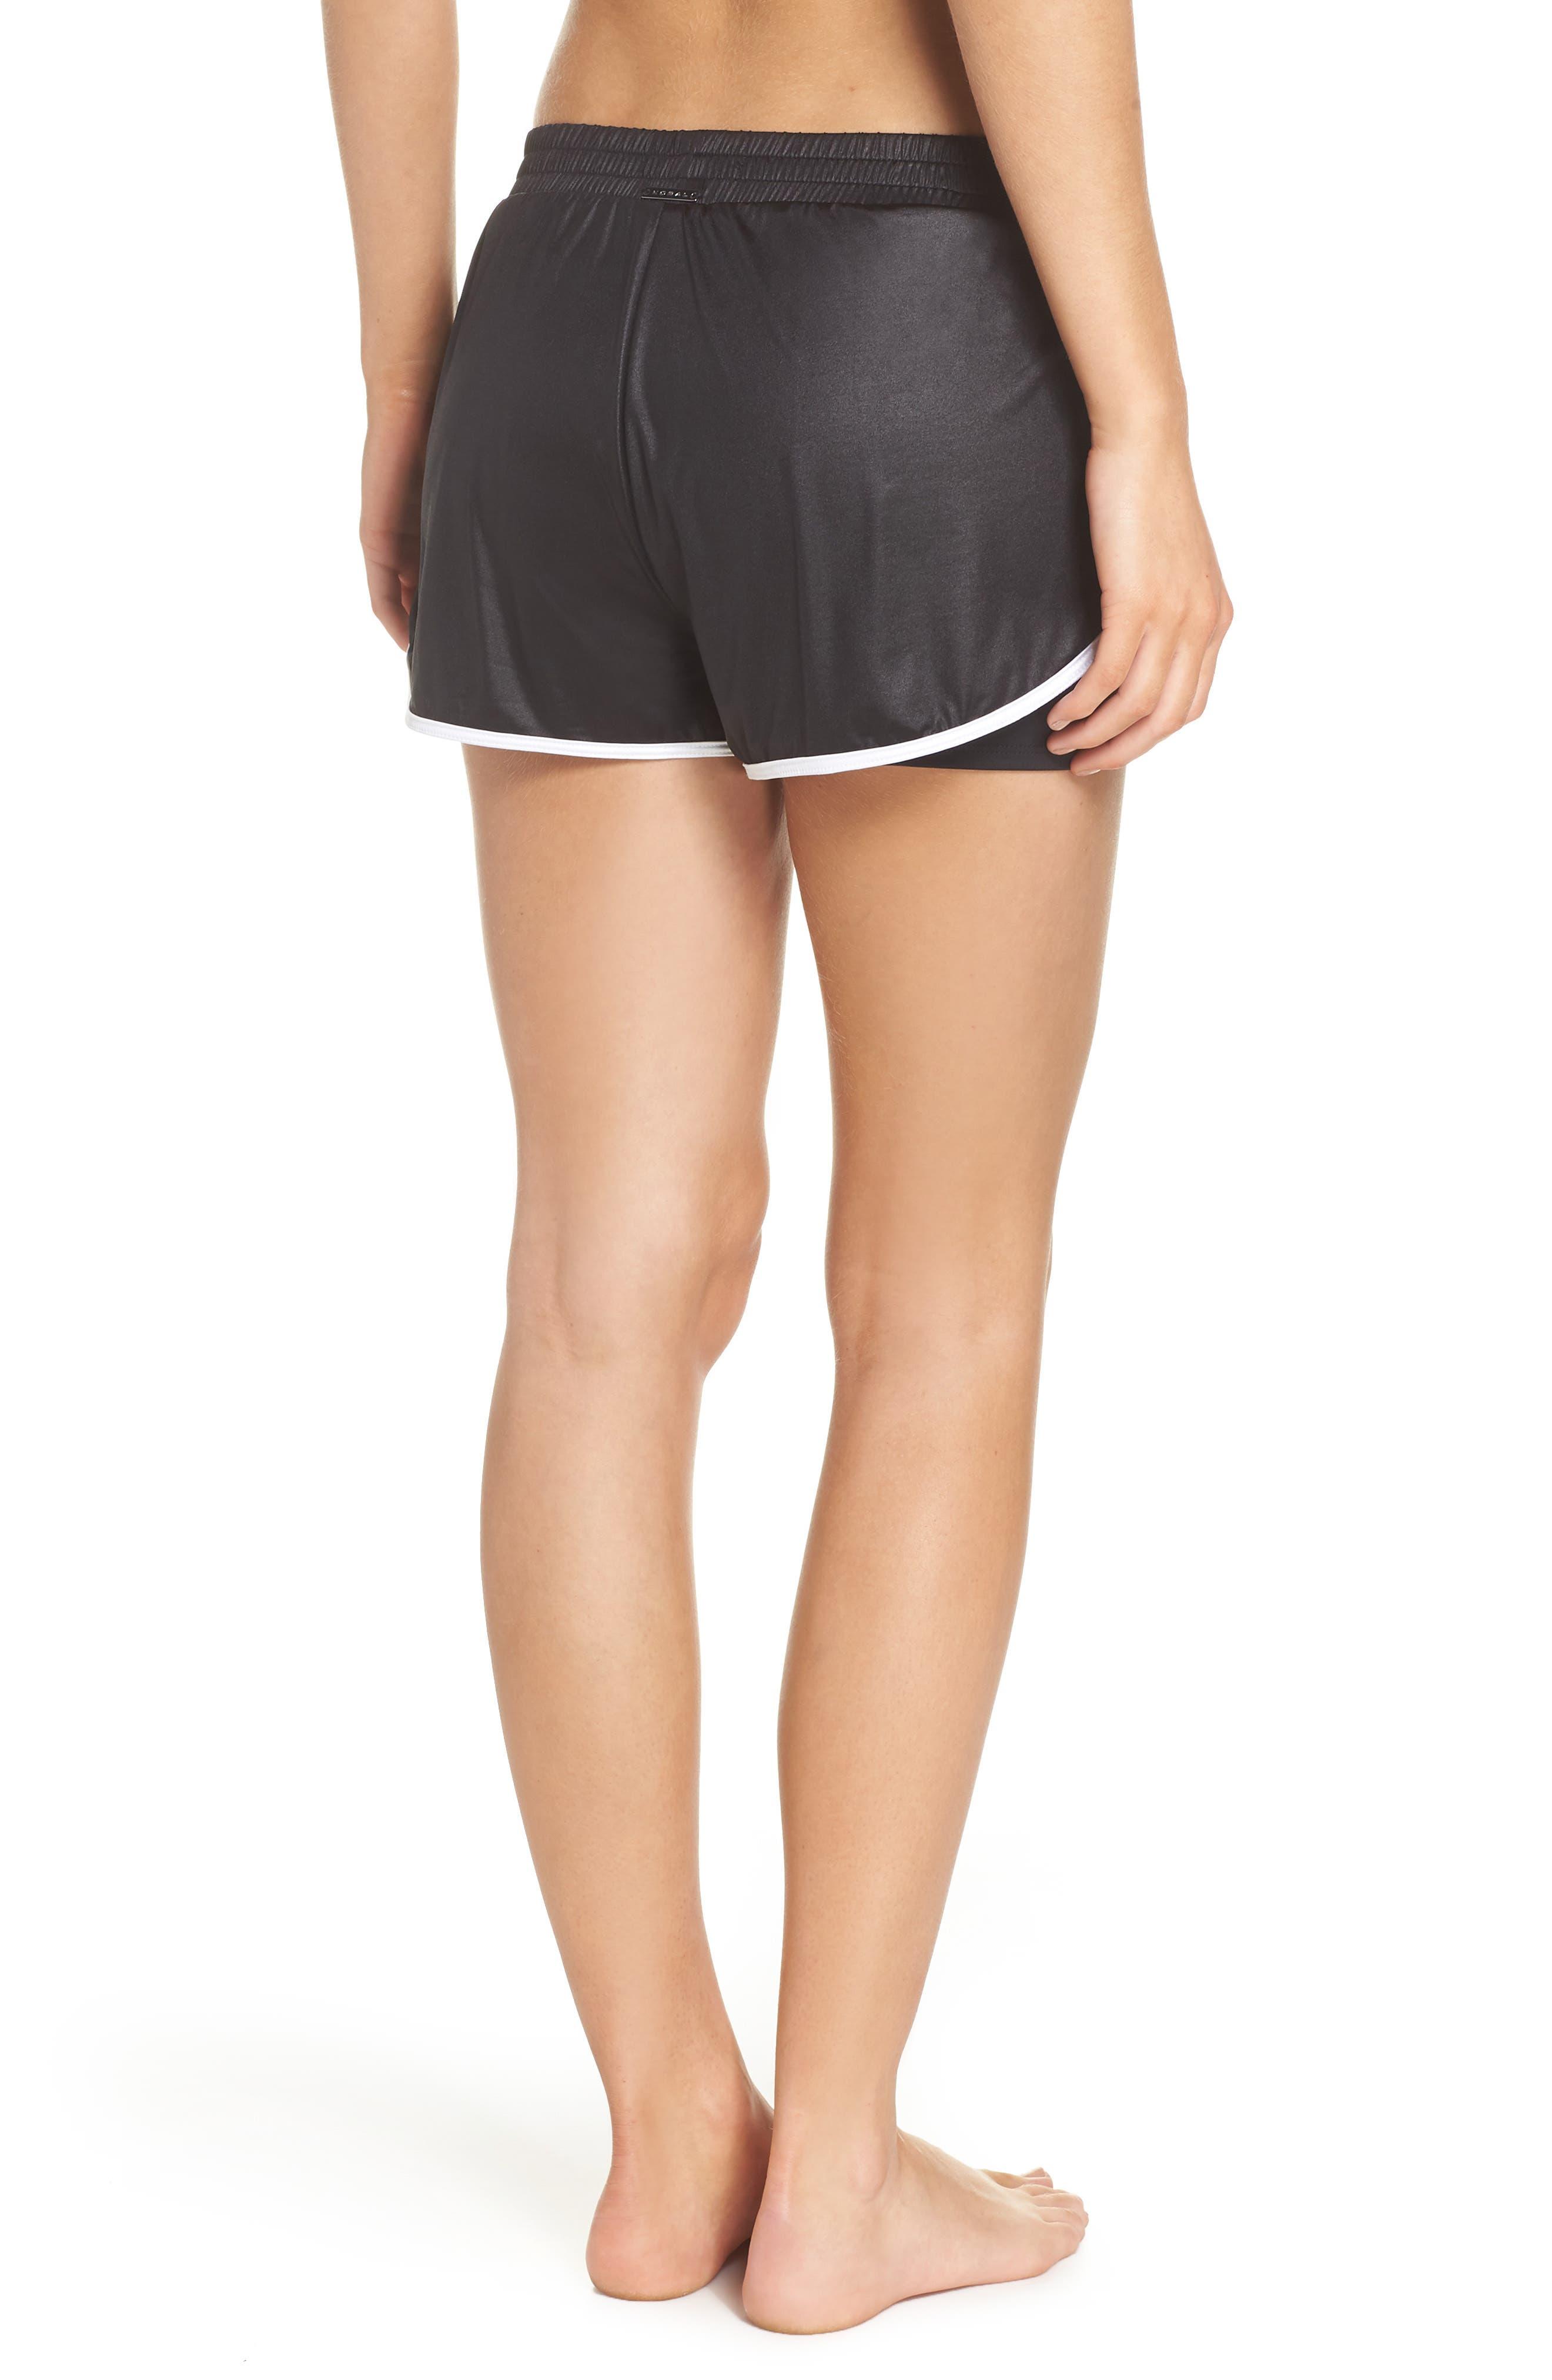 Scout Gym Shorts,                             Alternate thumbnail 2, color,                             BLACK/ WHITE